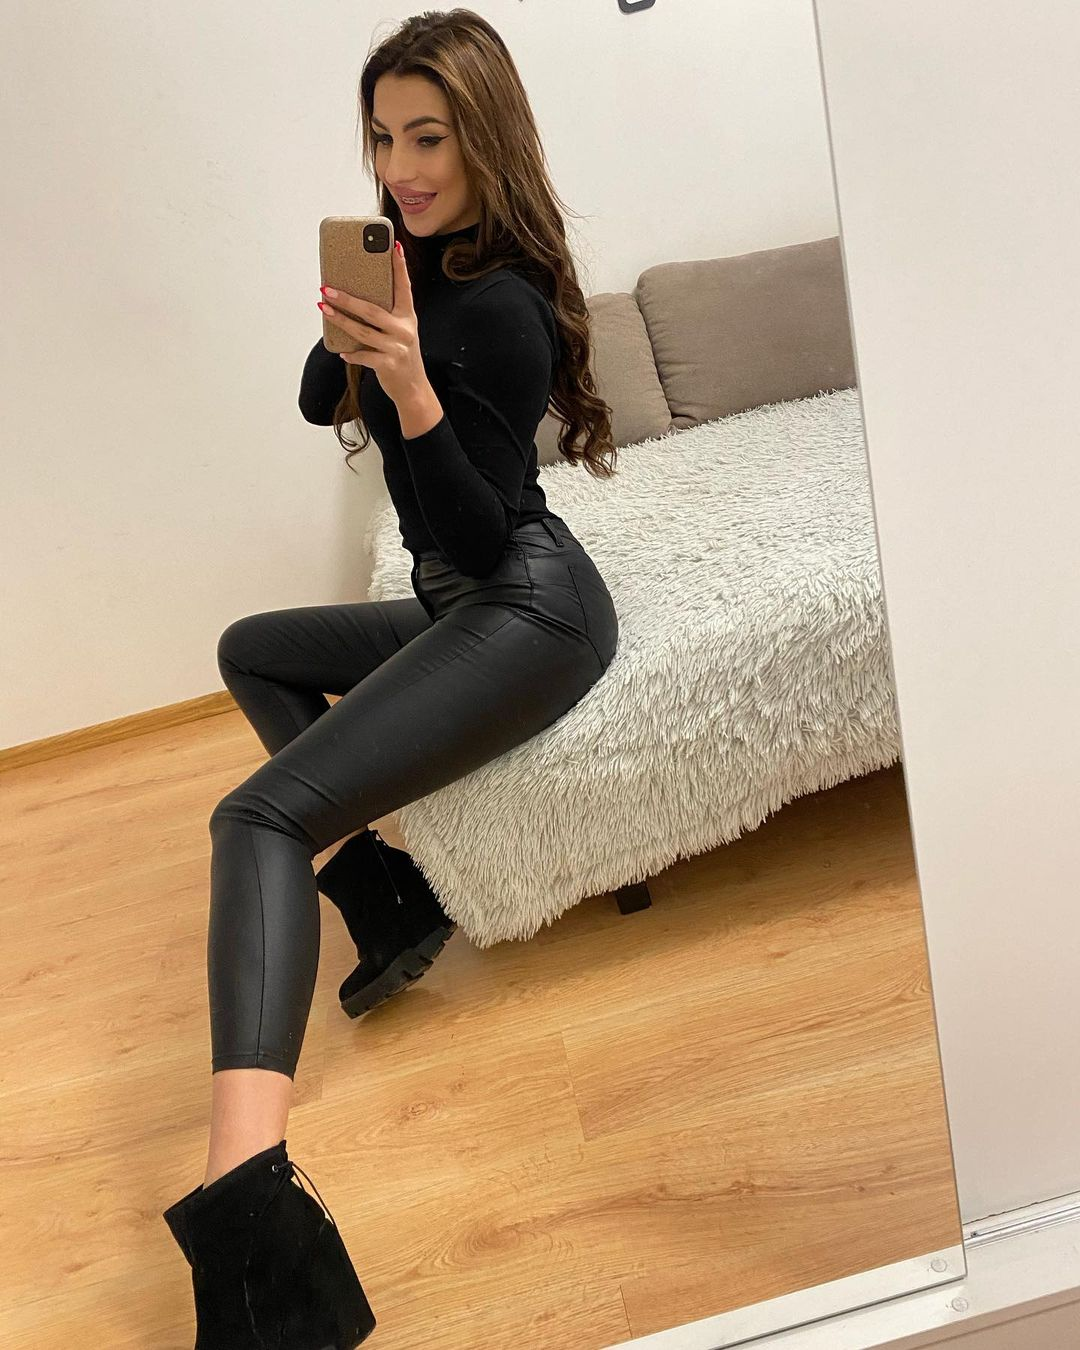 Adrianna-Gotowicka-Wallpapers-Insta-Fit-Bio-2